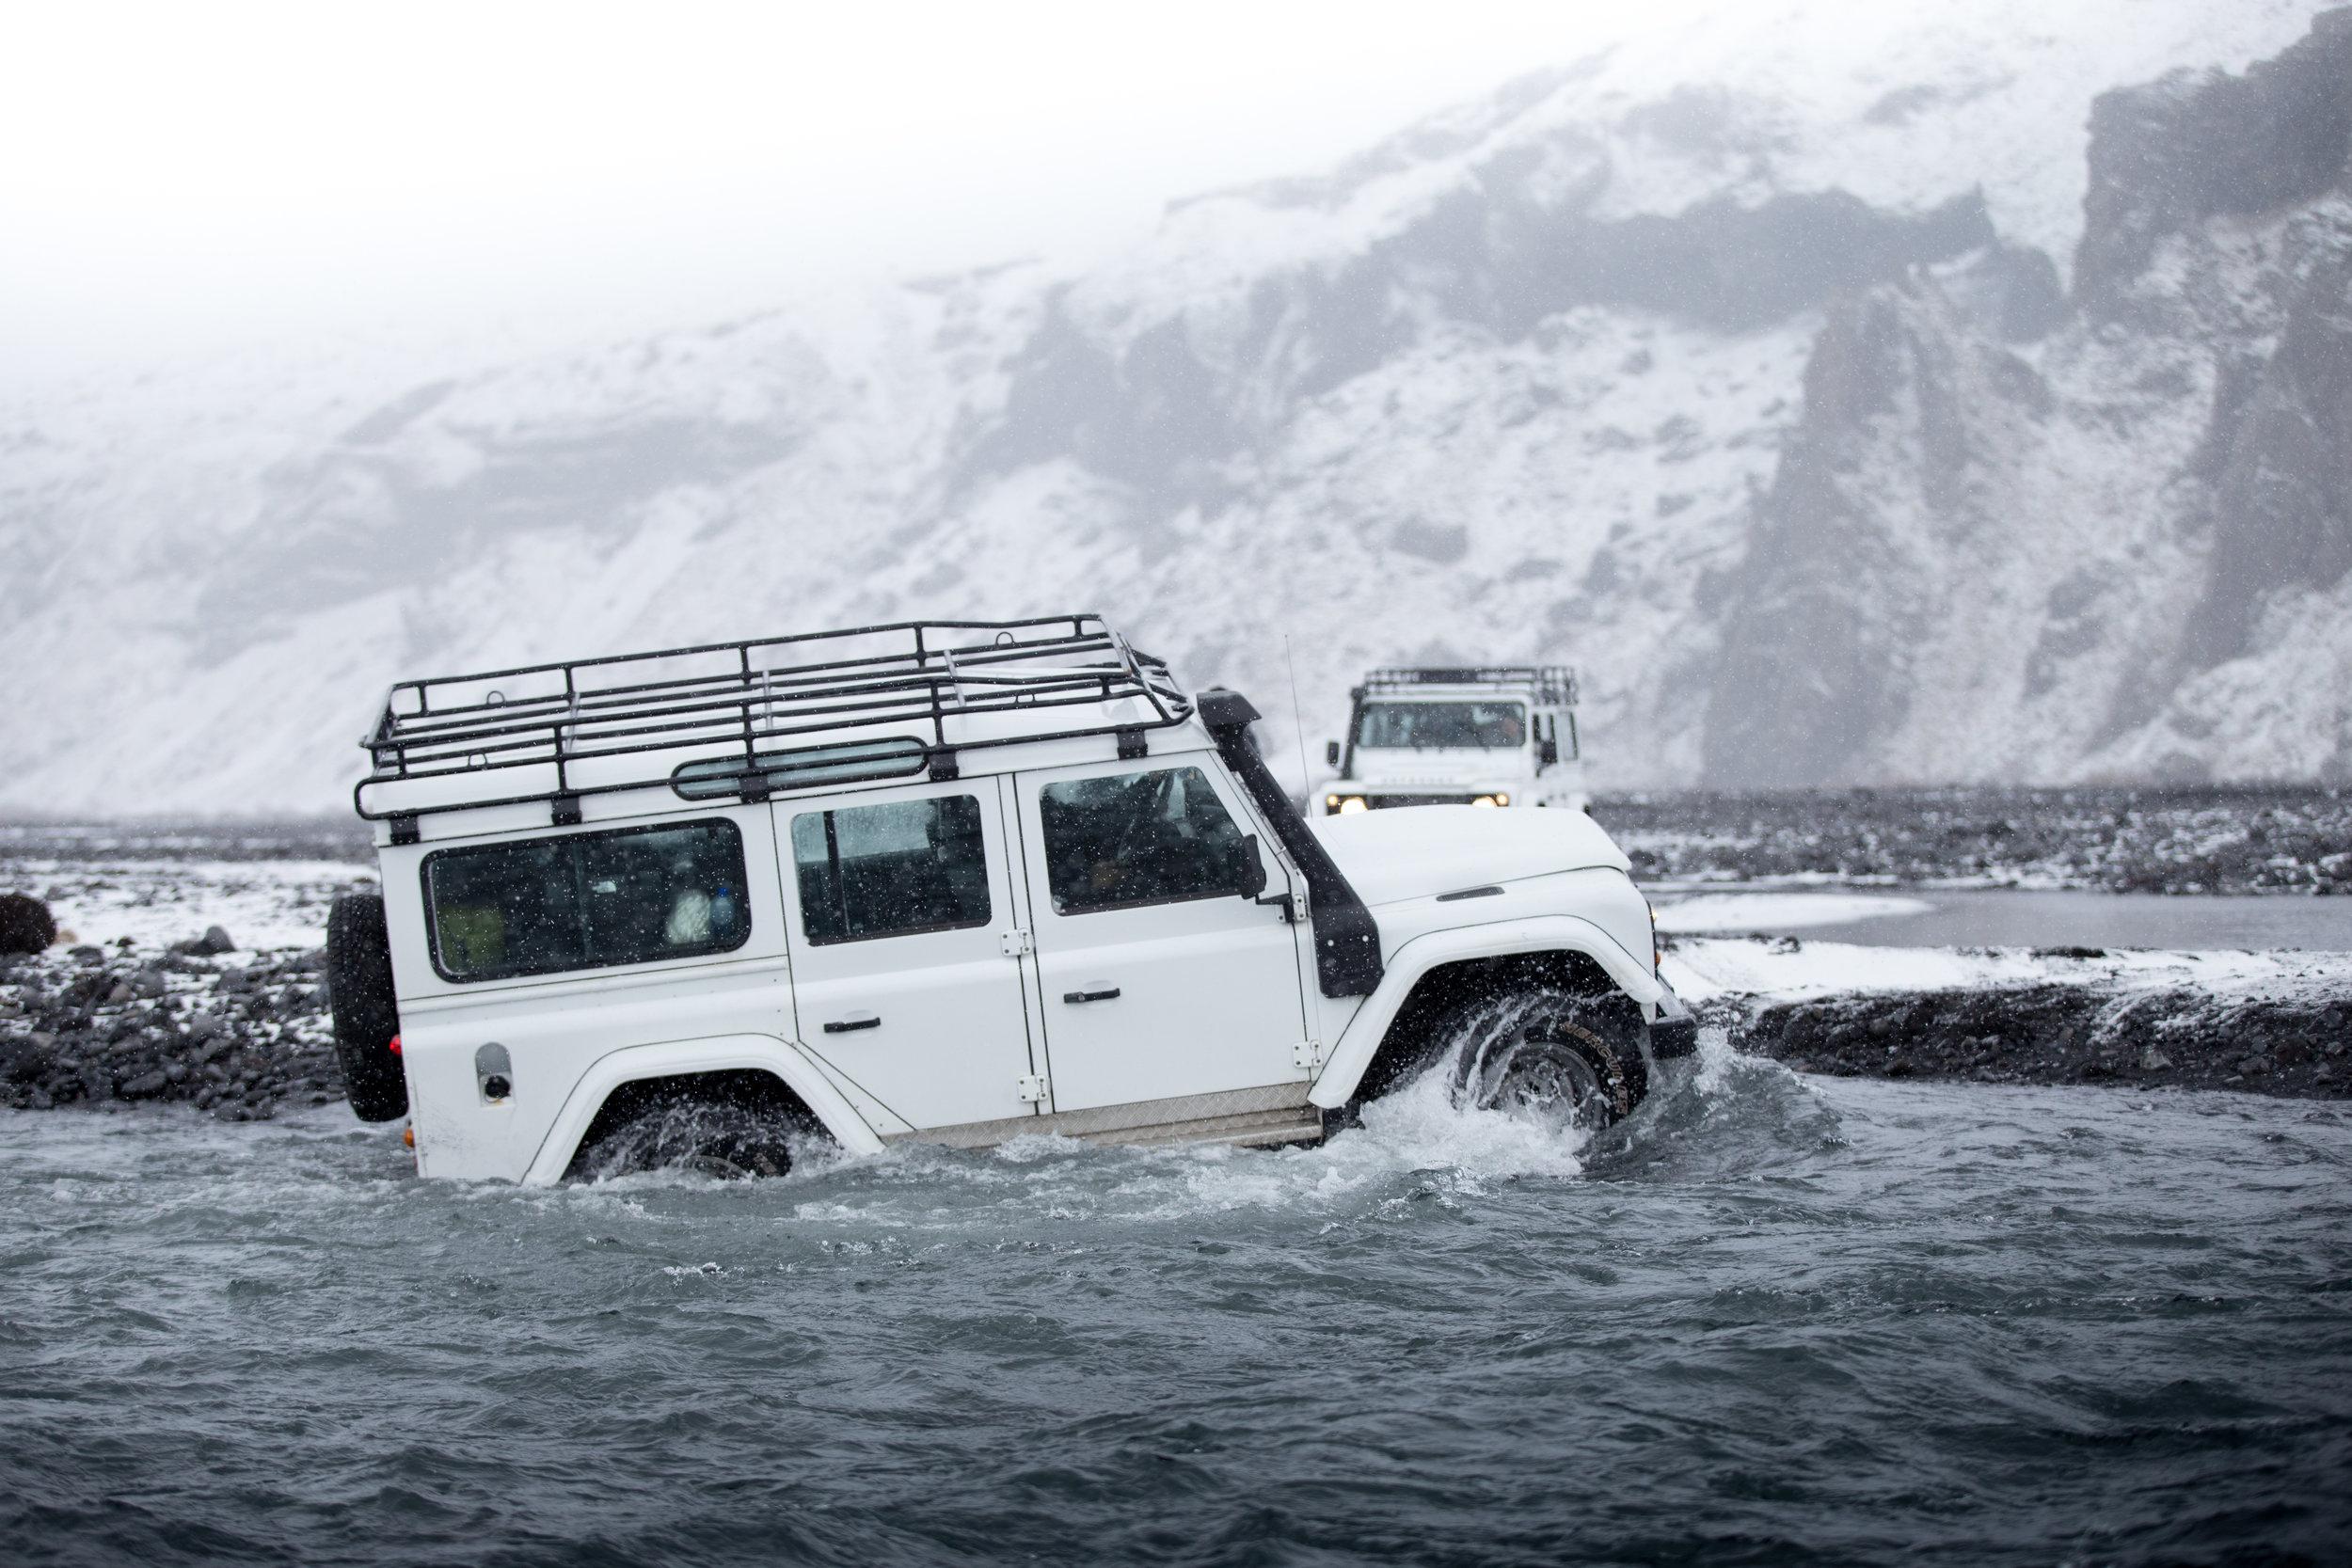 jermiah-schuster-iceland-125.jpg